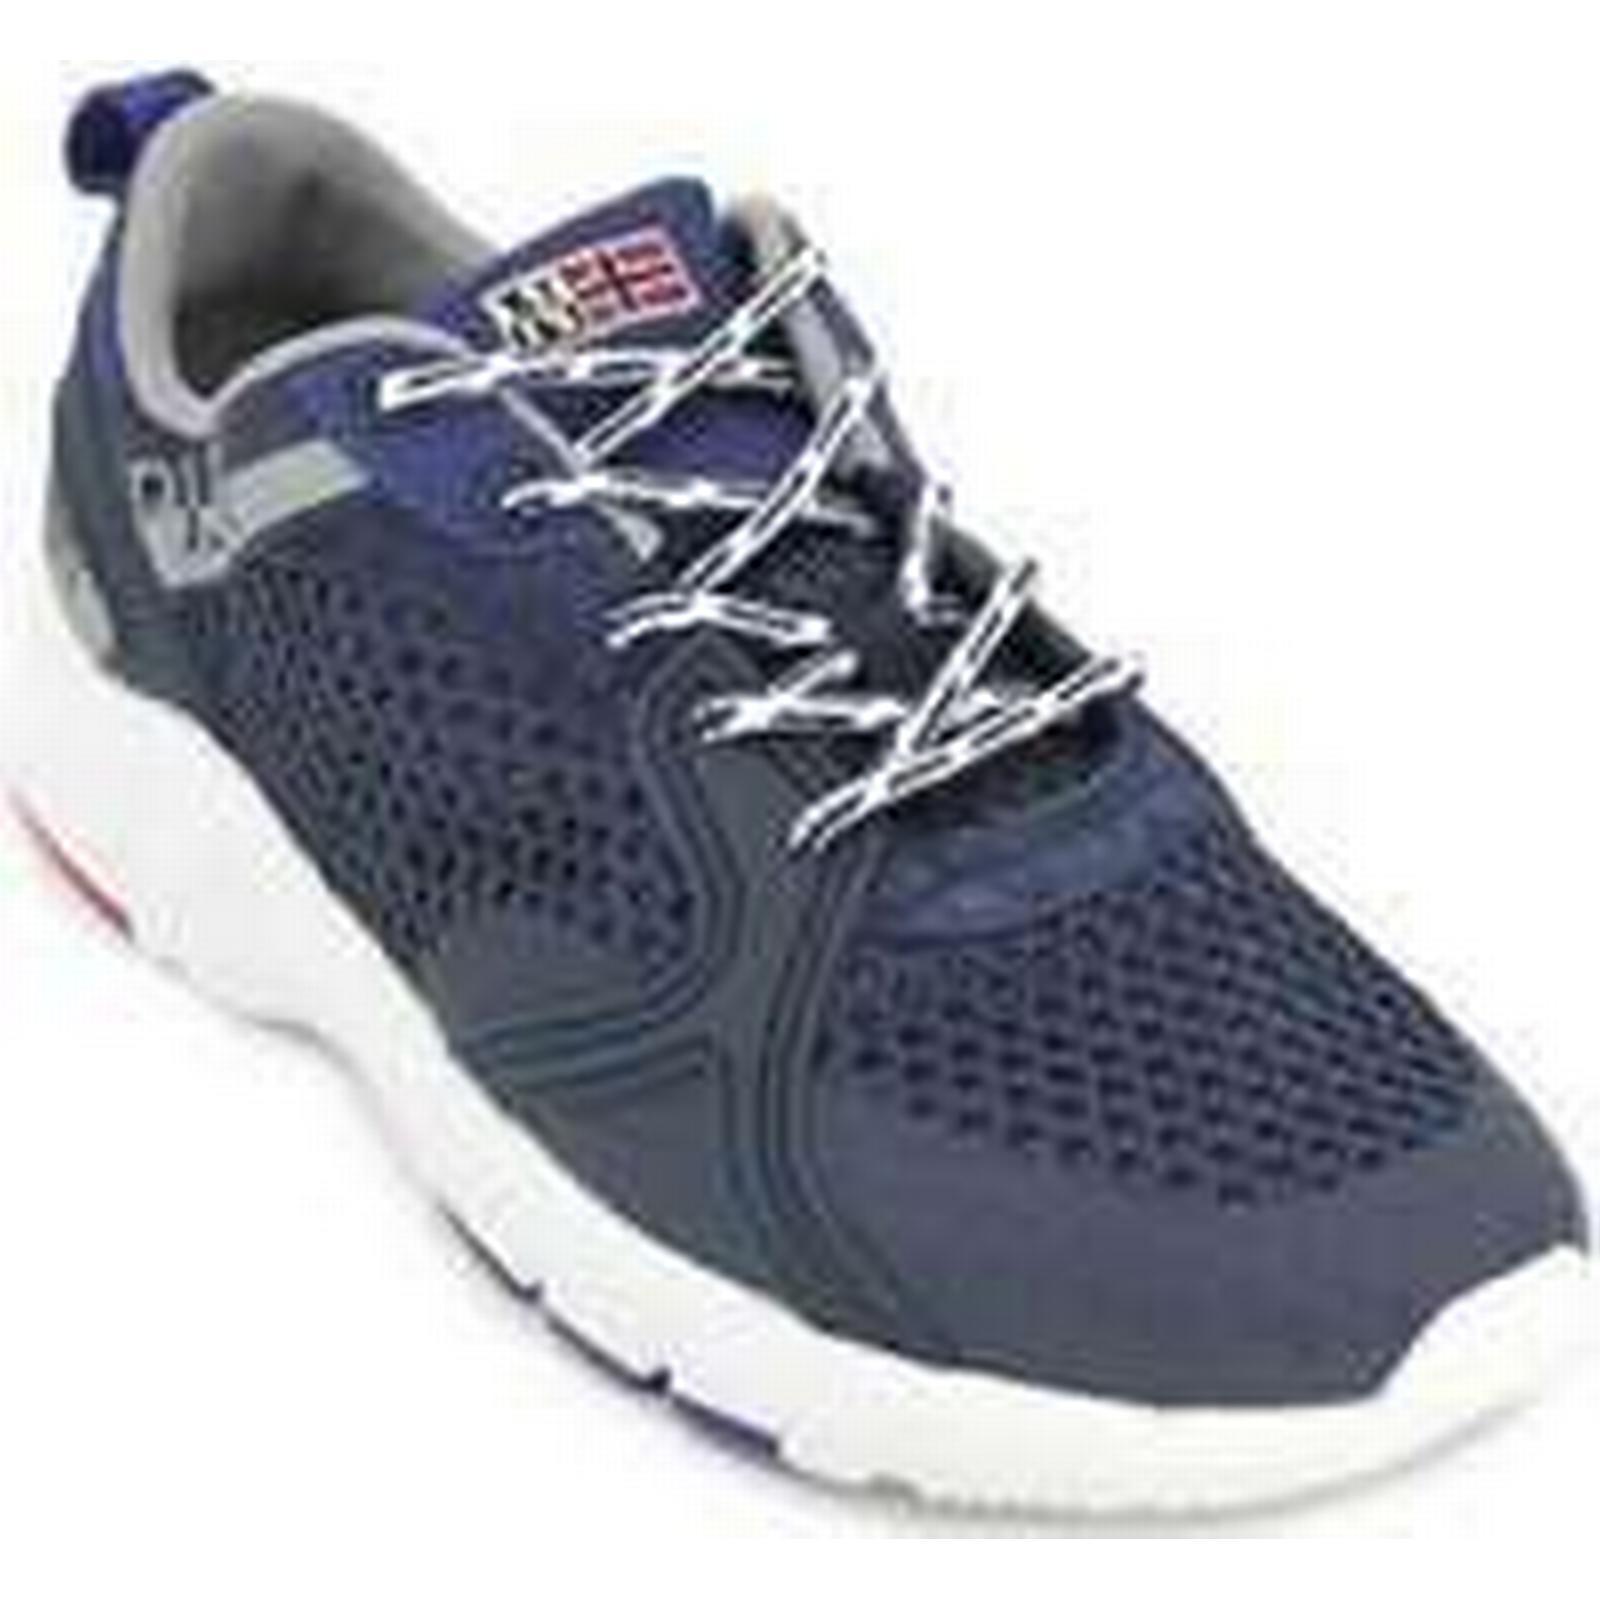 Spartoo.co.uk Sneakers Napapijri Optima 16833616 Men's Sneakers Spartoo.co.uk men's Shoes (Trainers) in Blue 95369c